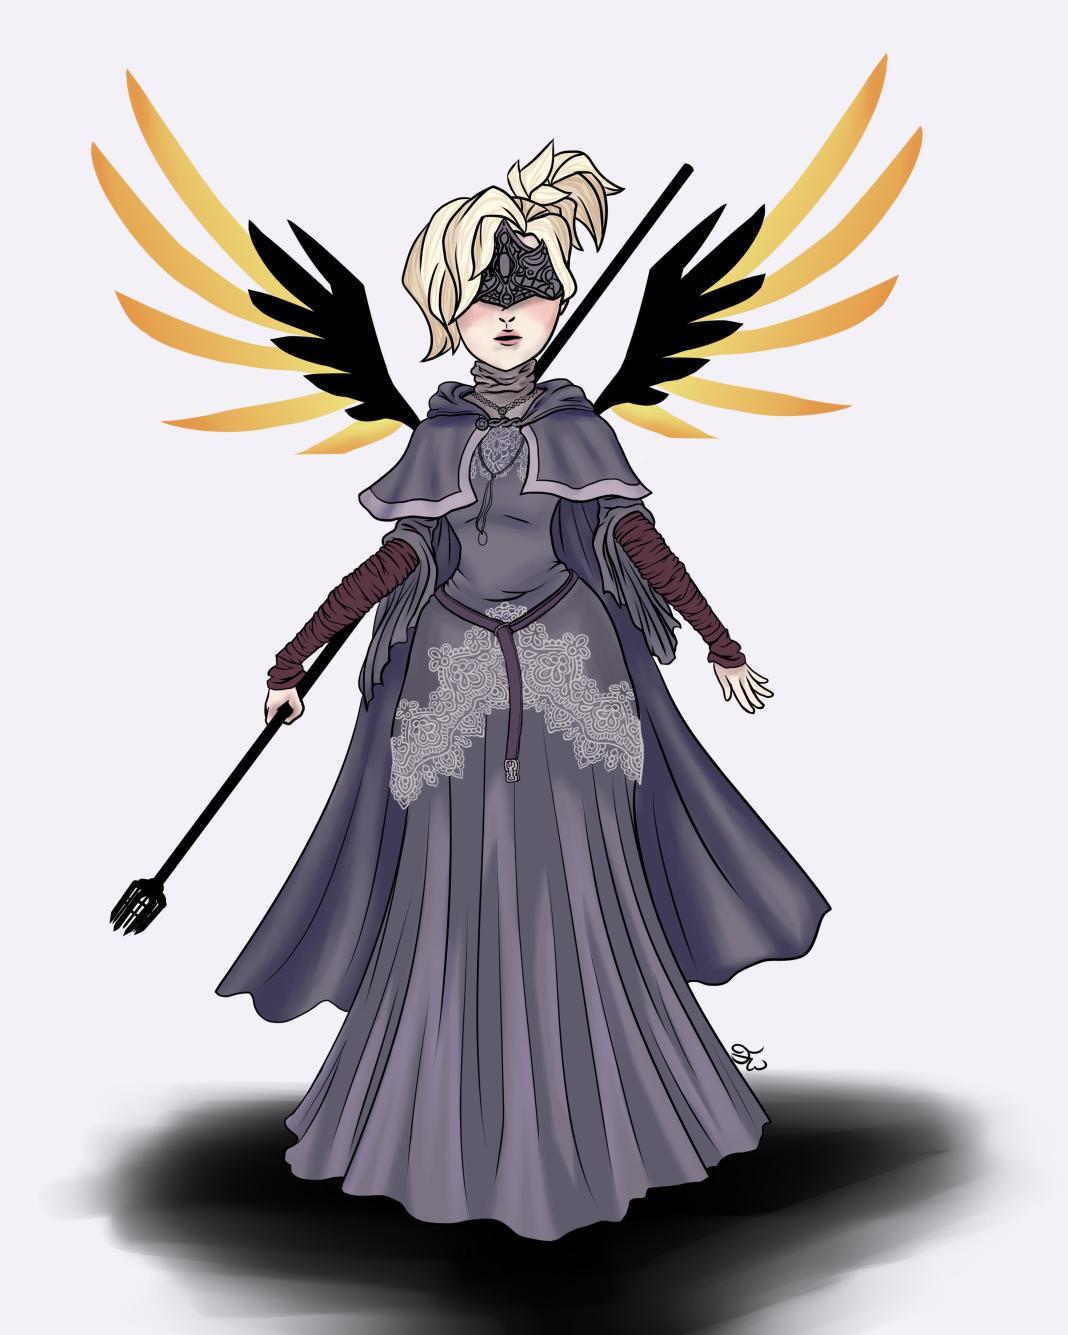 Mercy Fire Keeper - Dark Souls Crossover com Overwatch - FanArt